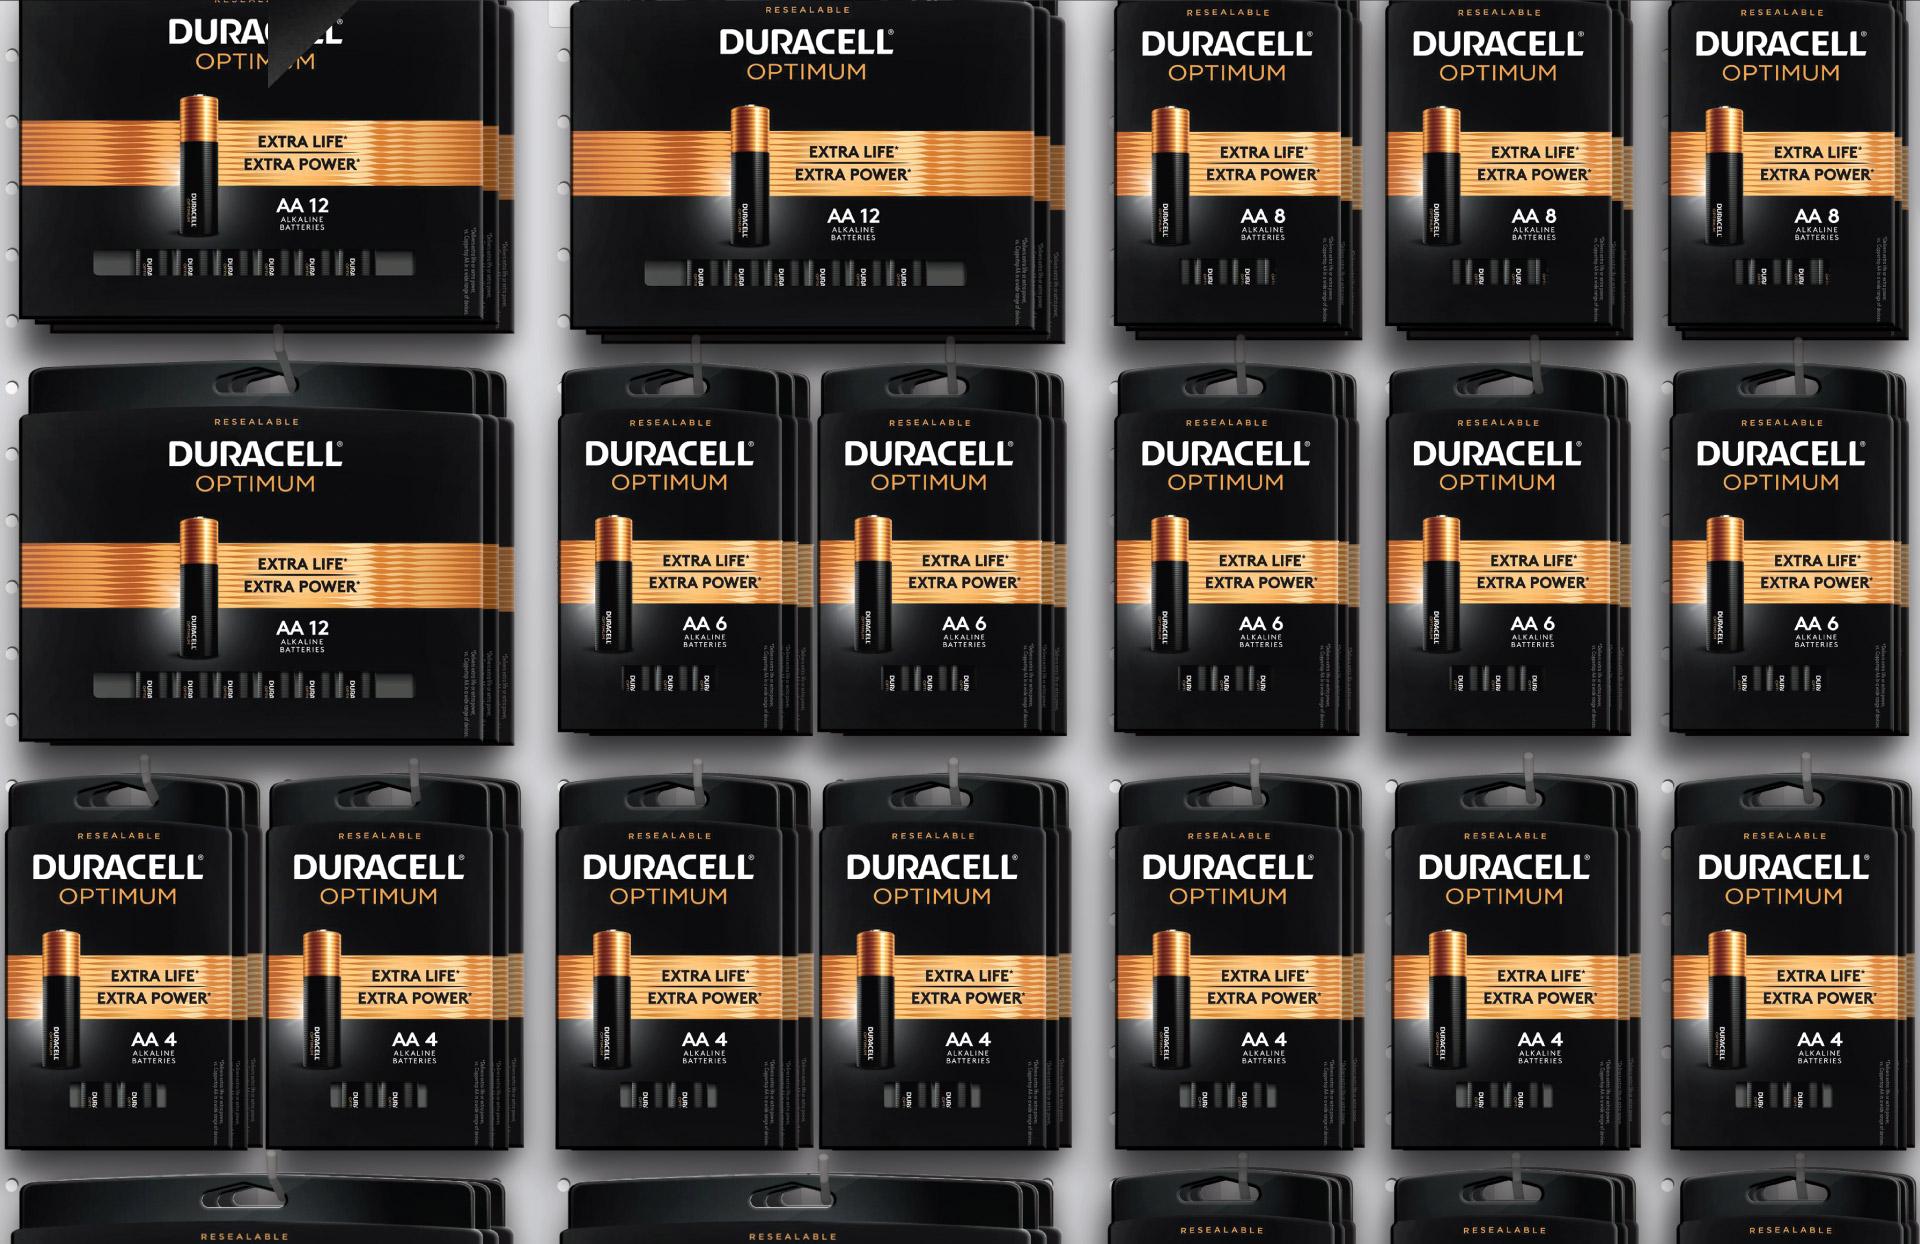 Duracell Optimum - Shelf Set